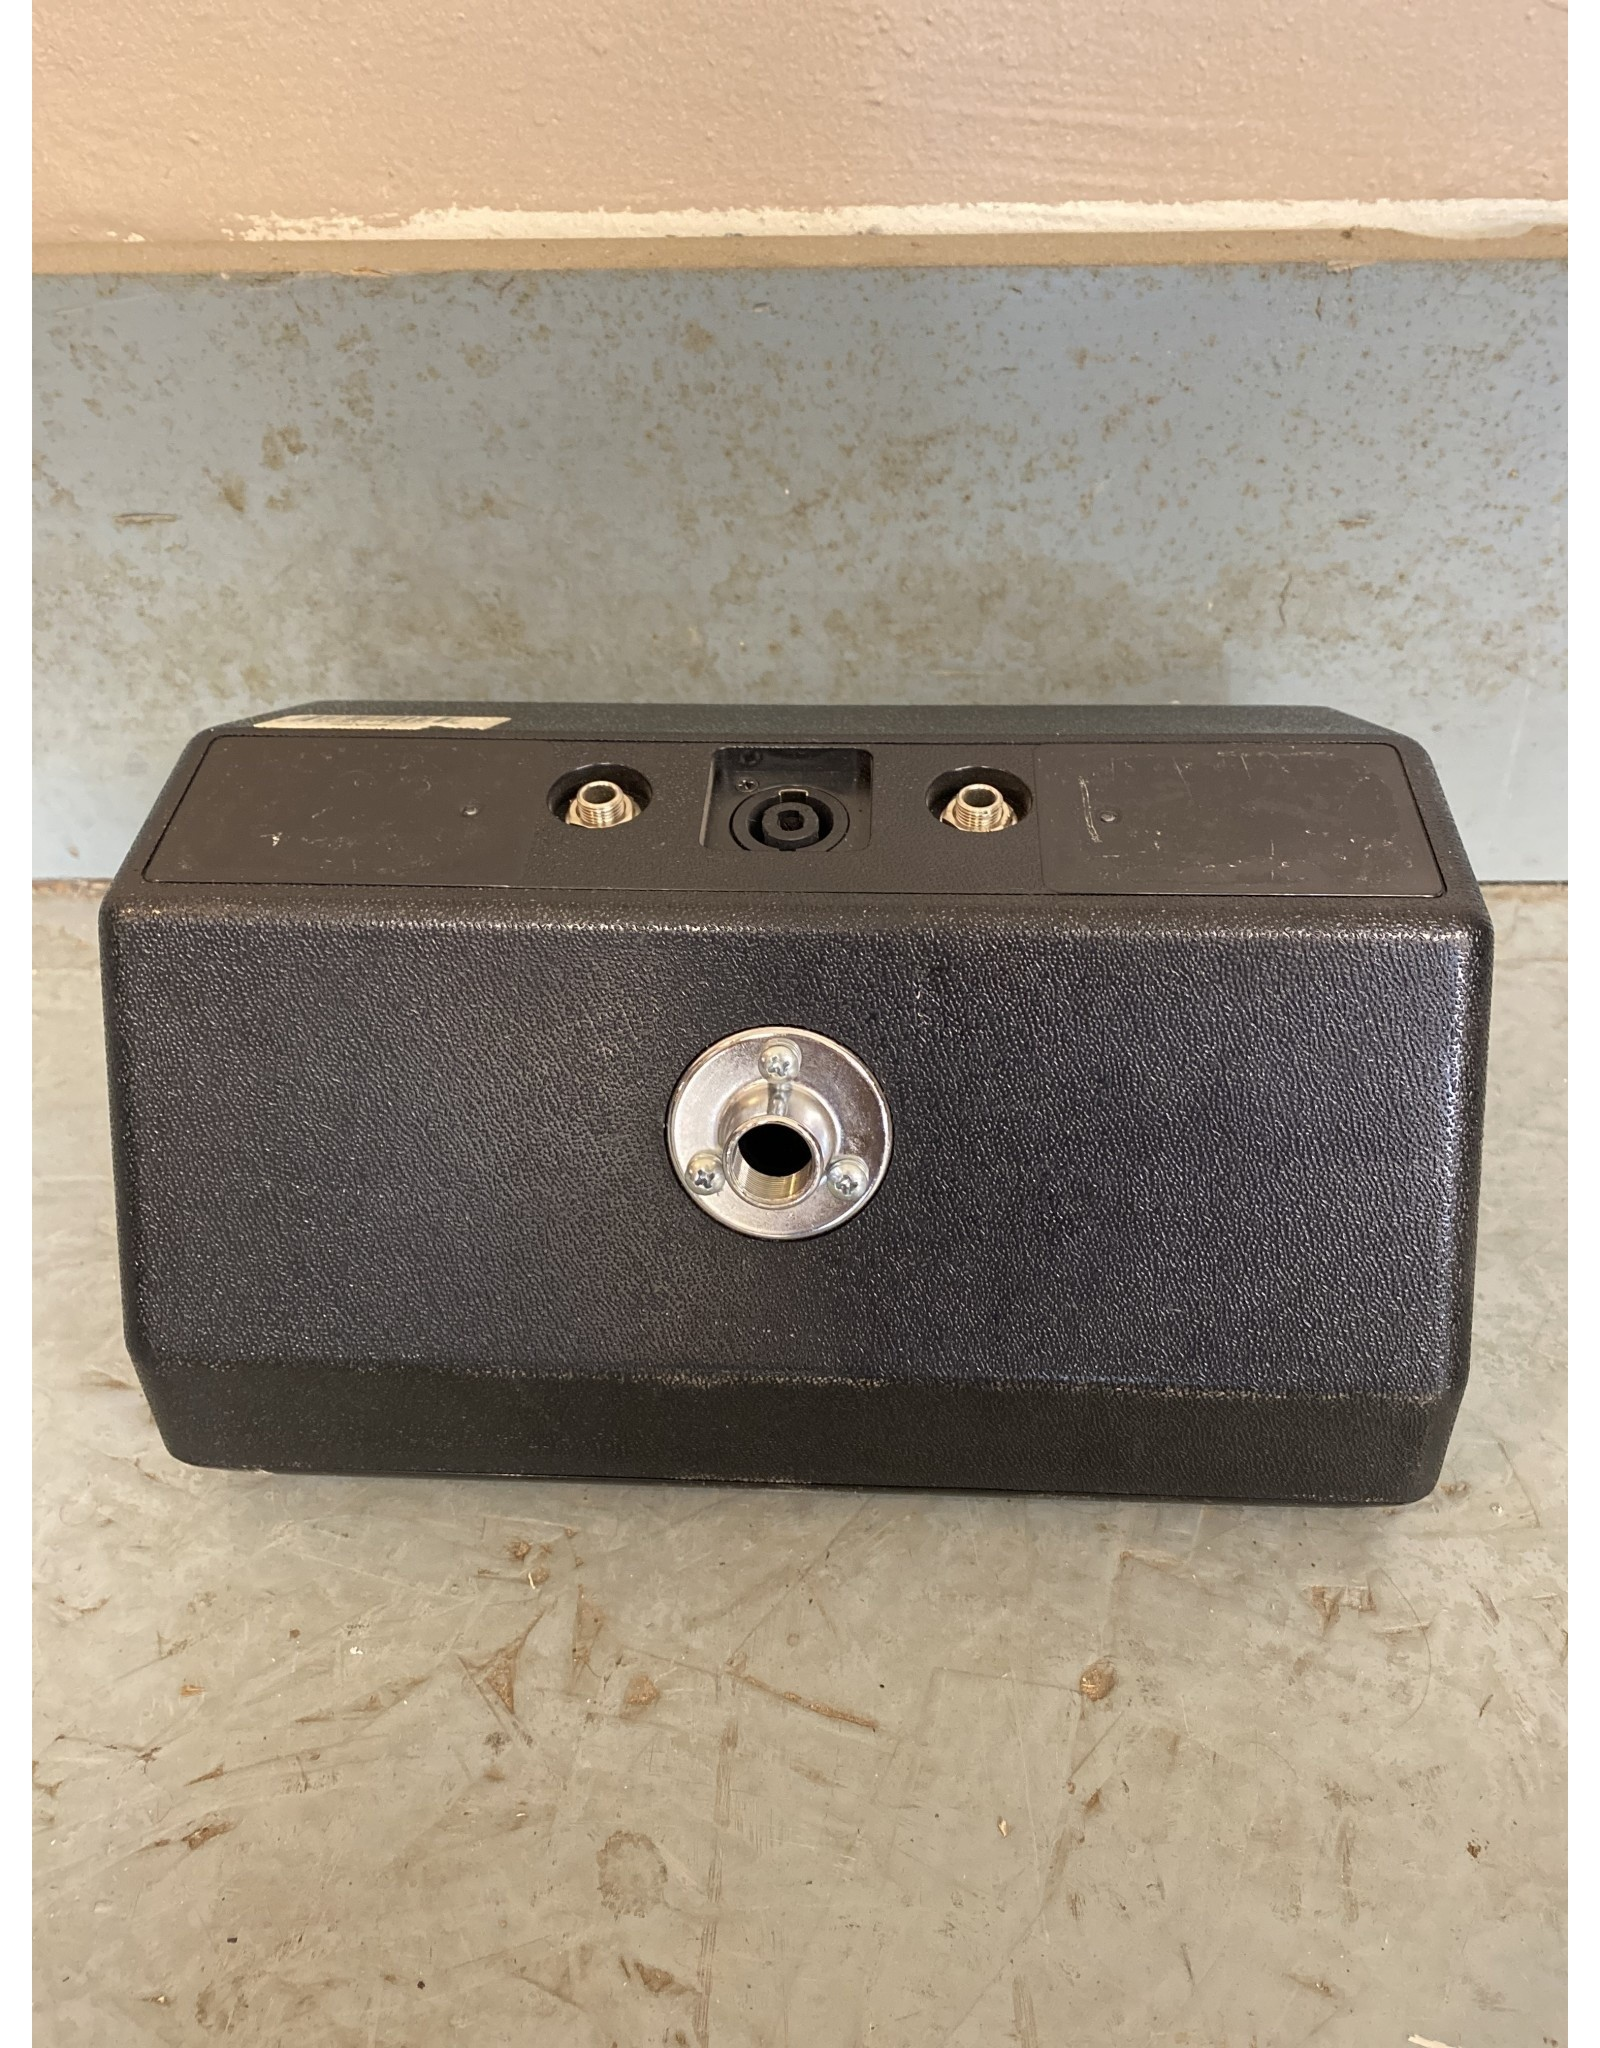 HotSpot Monitor (used)